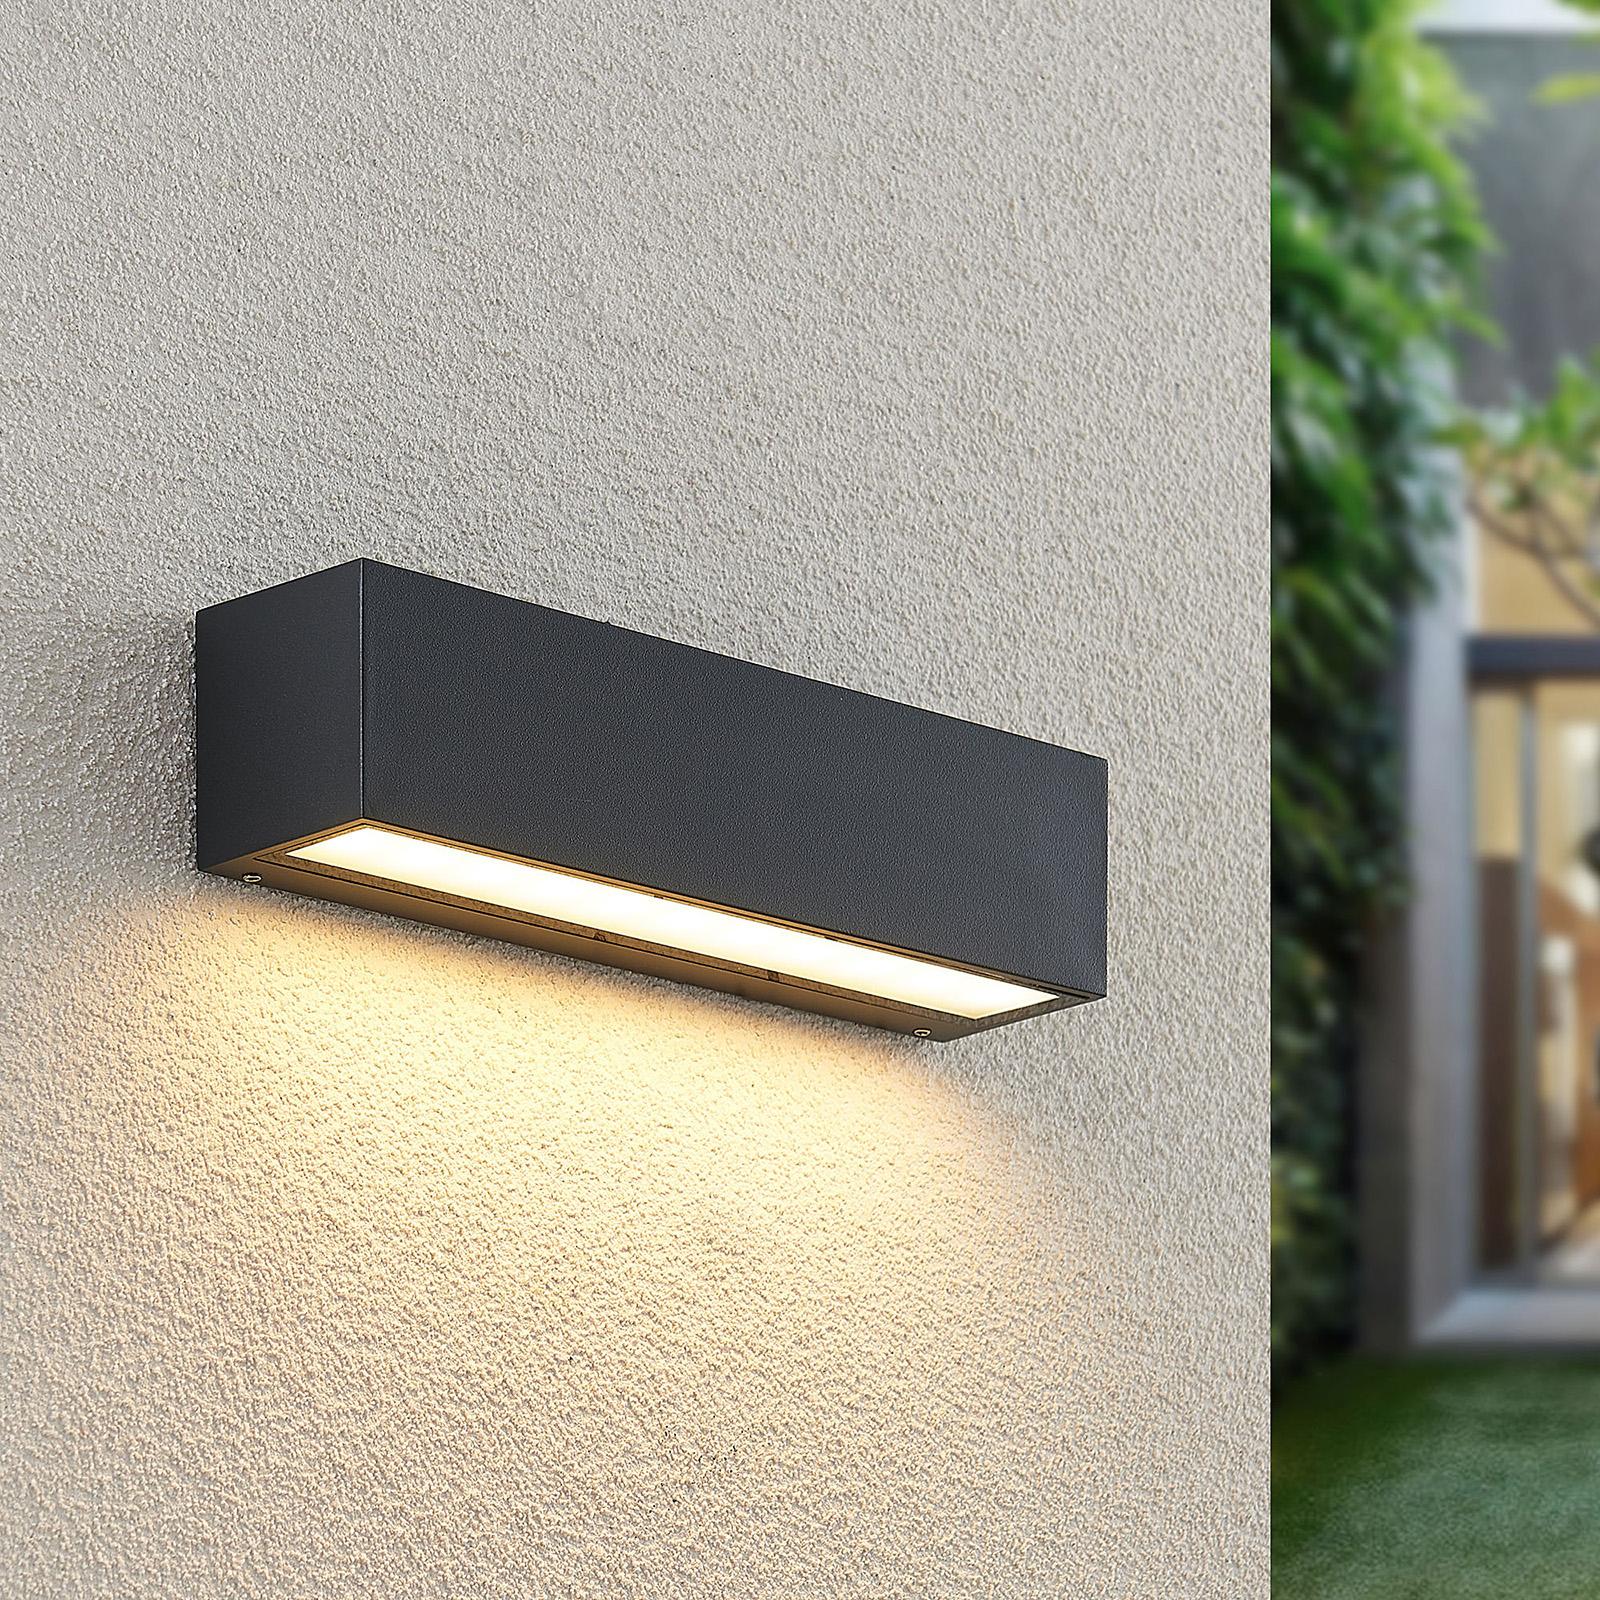 Lucande Lengo-LED-seinävalo 25cm grafiitti 1 lamp.